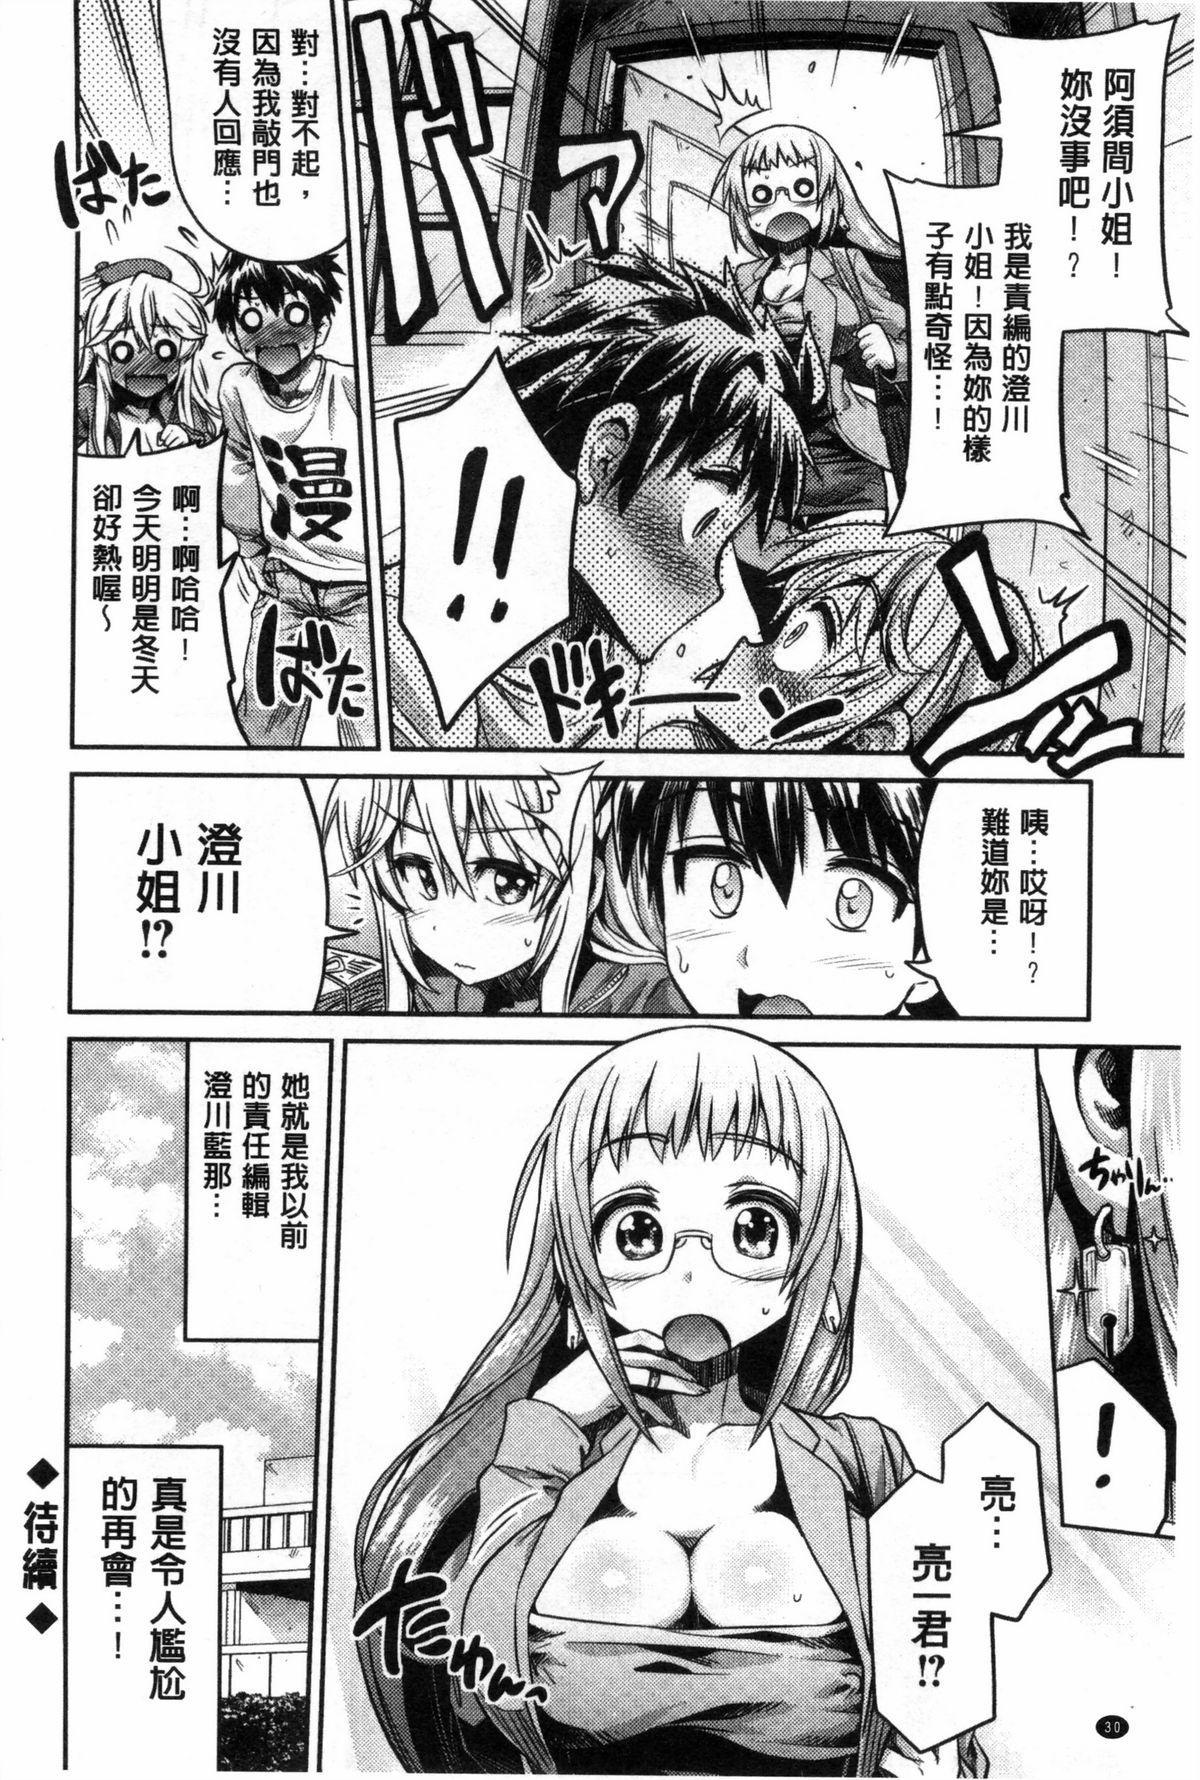 Man x Koi - Ero Manga de Hajimaru Koi no Plot   A漫×戀情 由情色漫畫所萌生的戀之物語 30